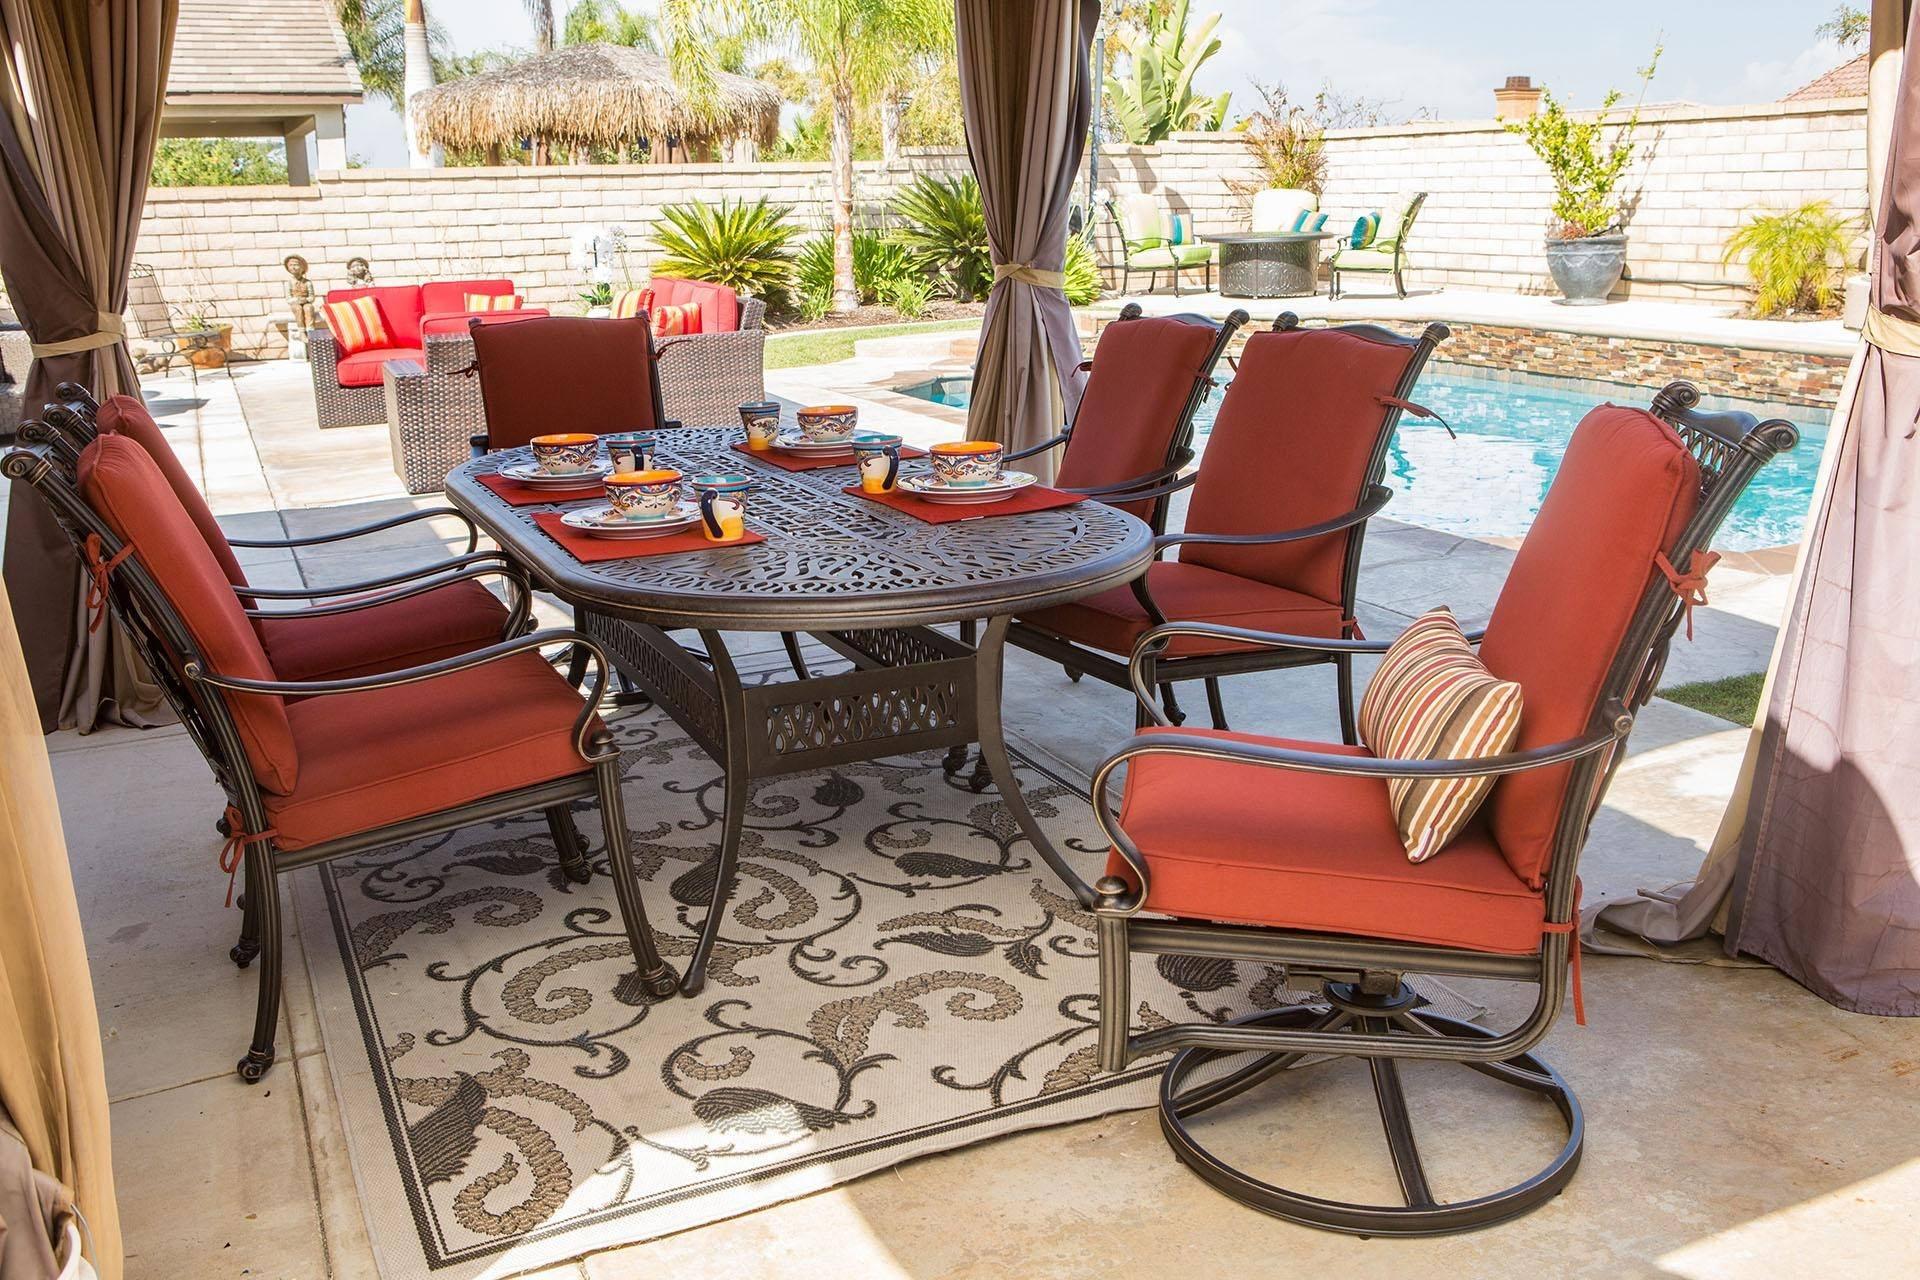 calipatio alexis patio club chair swivel rocker 2 pcs in bronze natural fabric